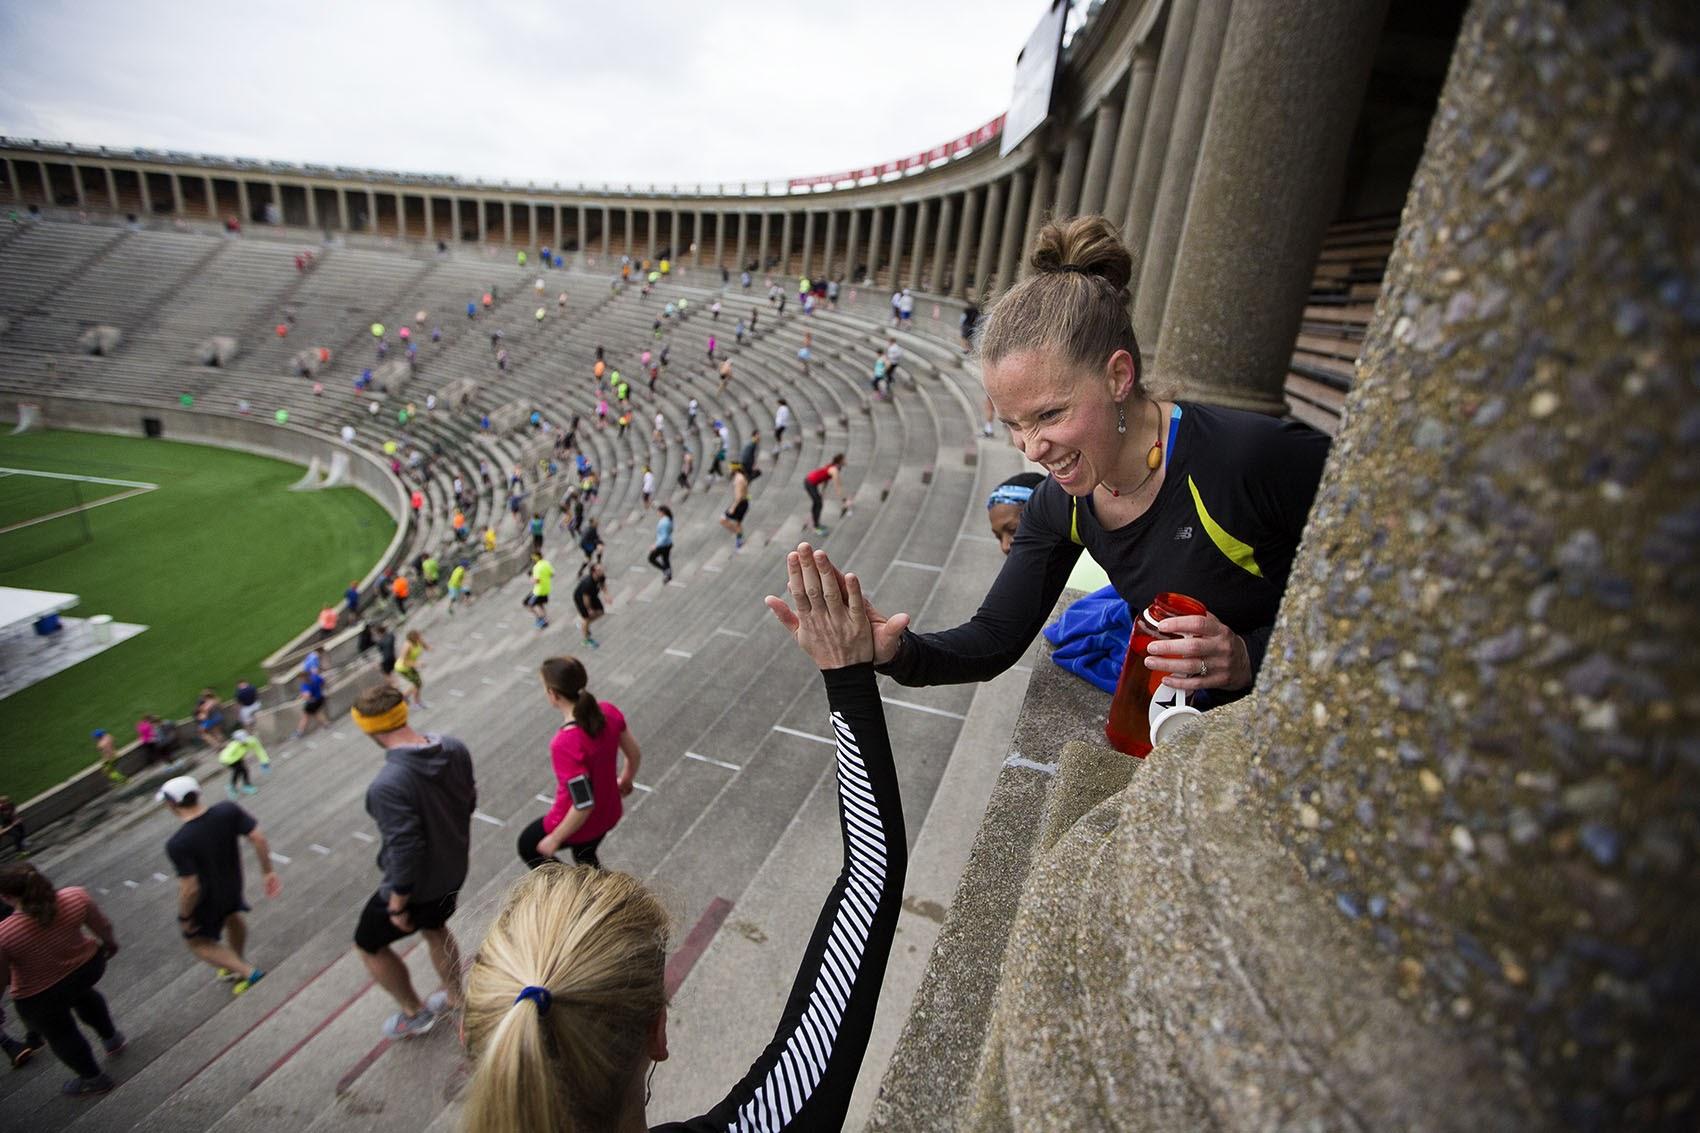 November Project participants climb stairs at Harvard Stadium in 2016. (Jesse Costa/WBUR).